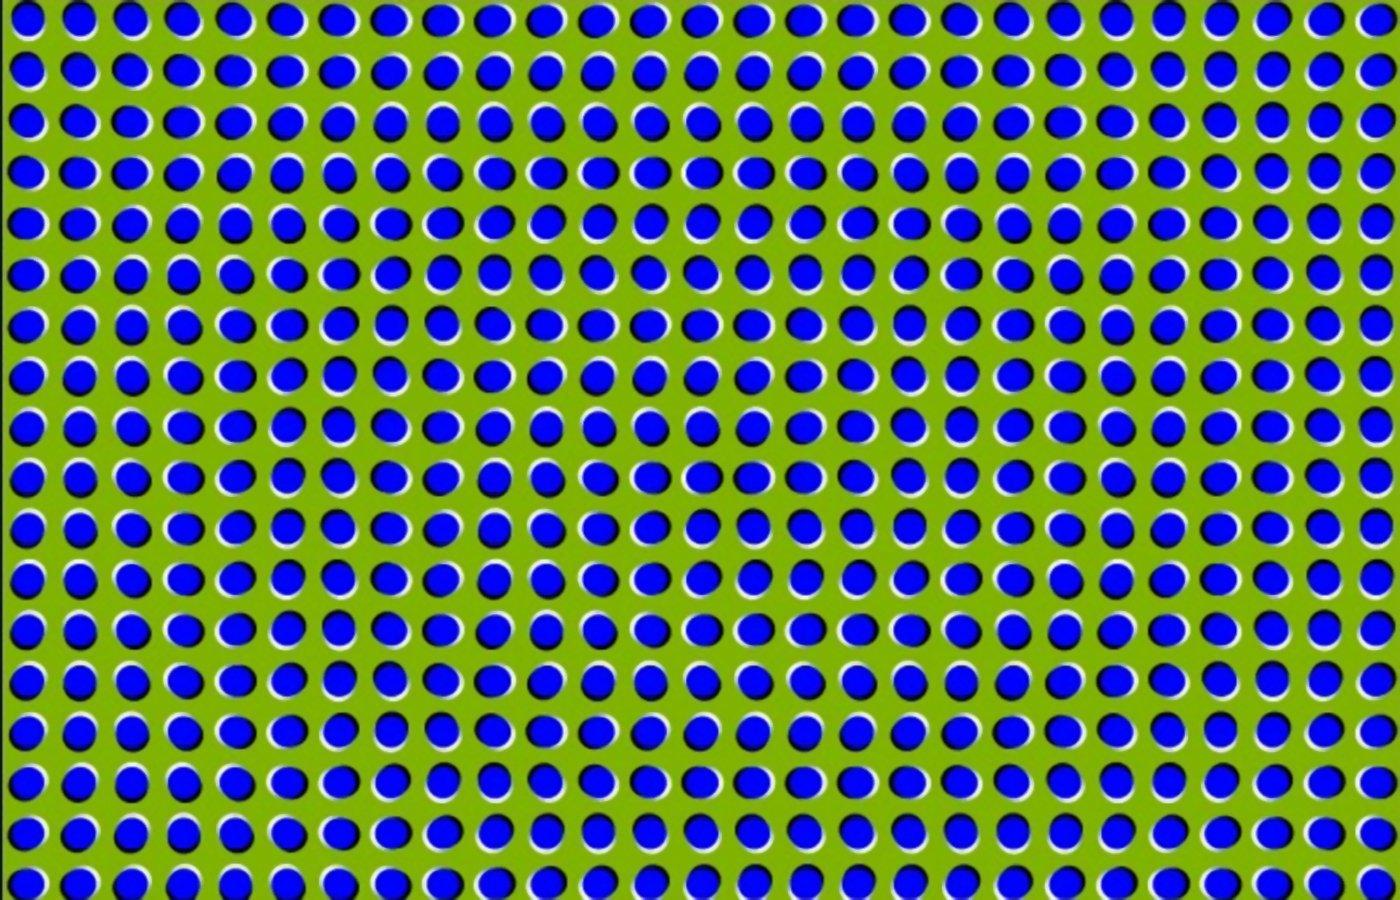 Trippy Wallpaper 1366x768